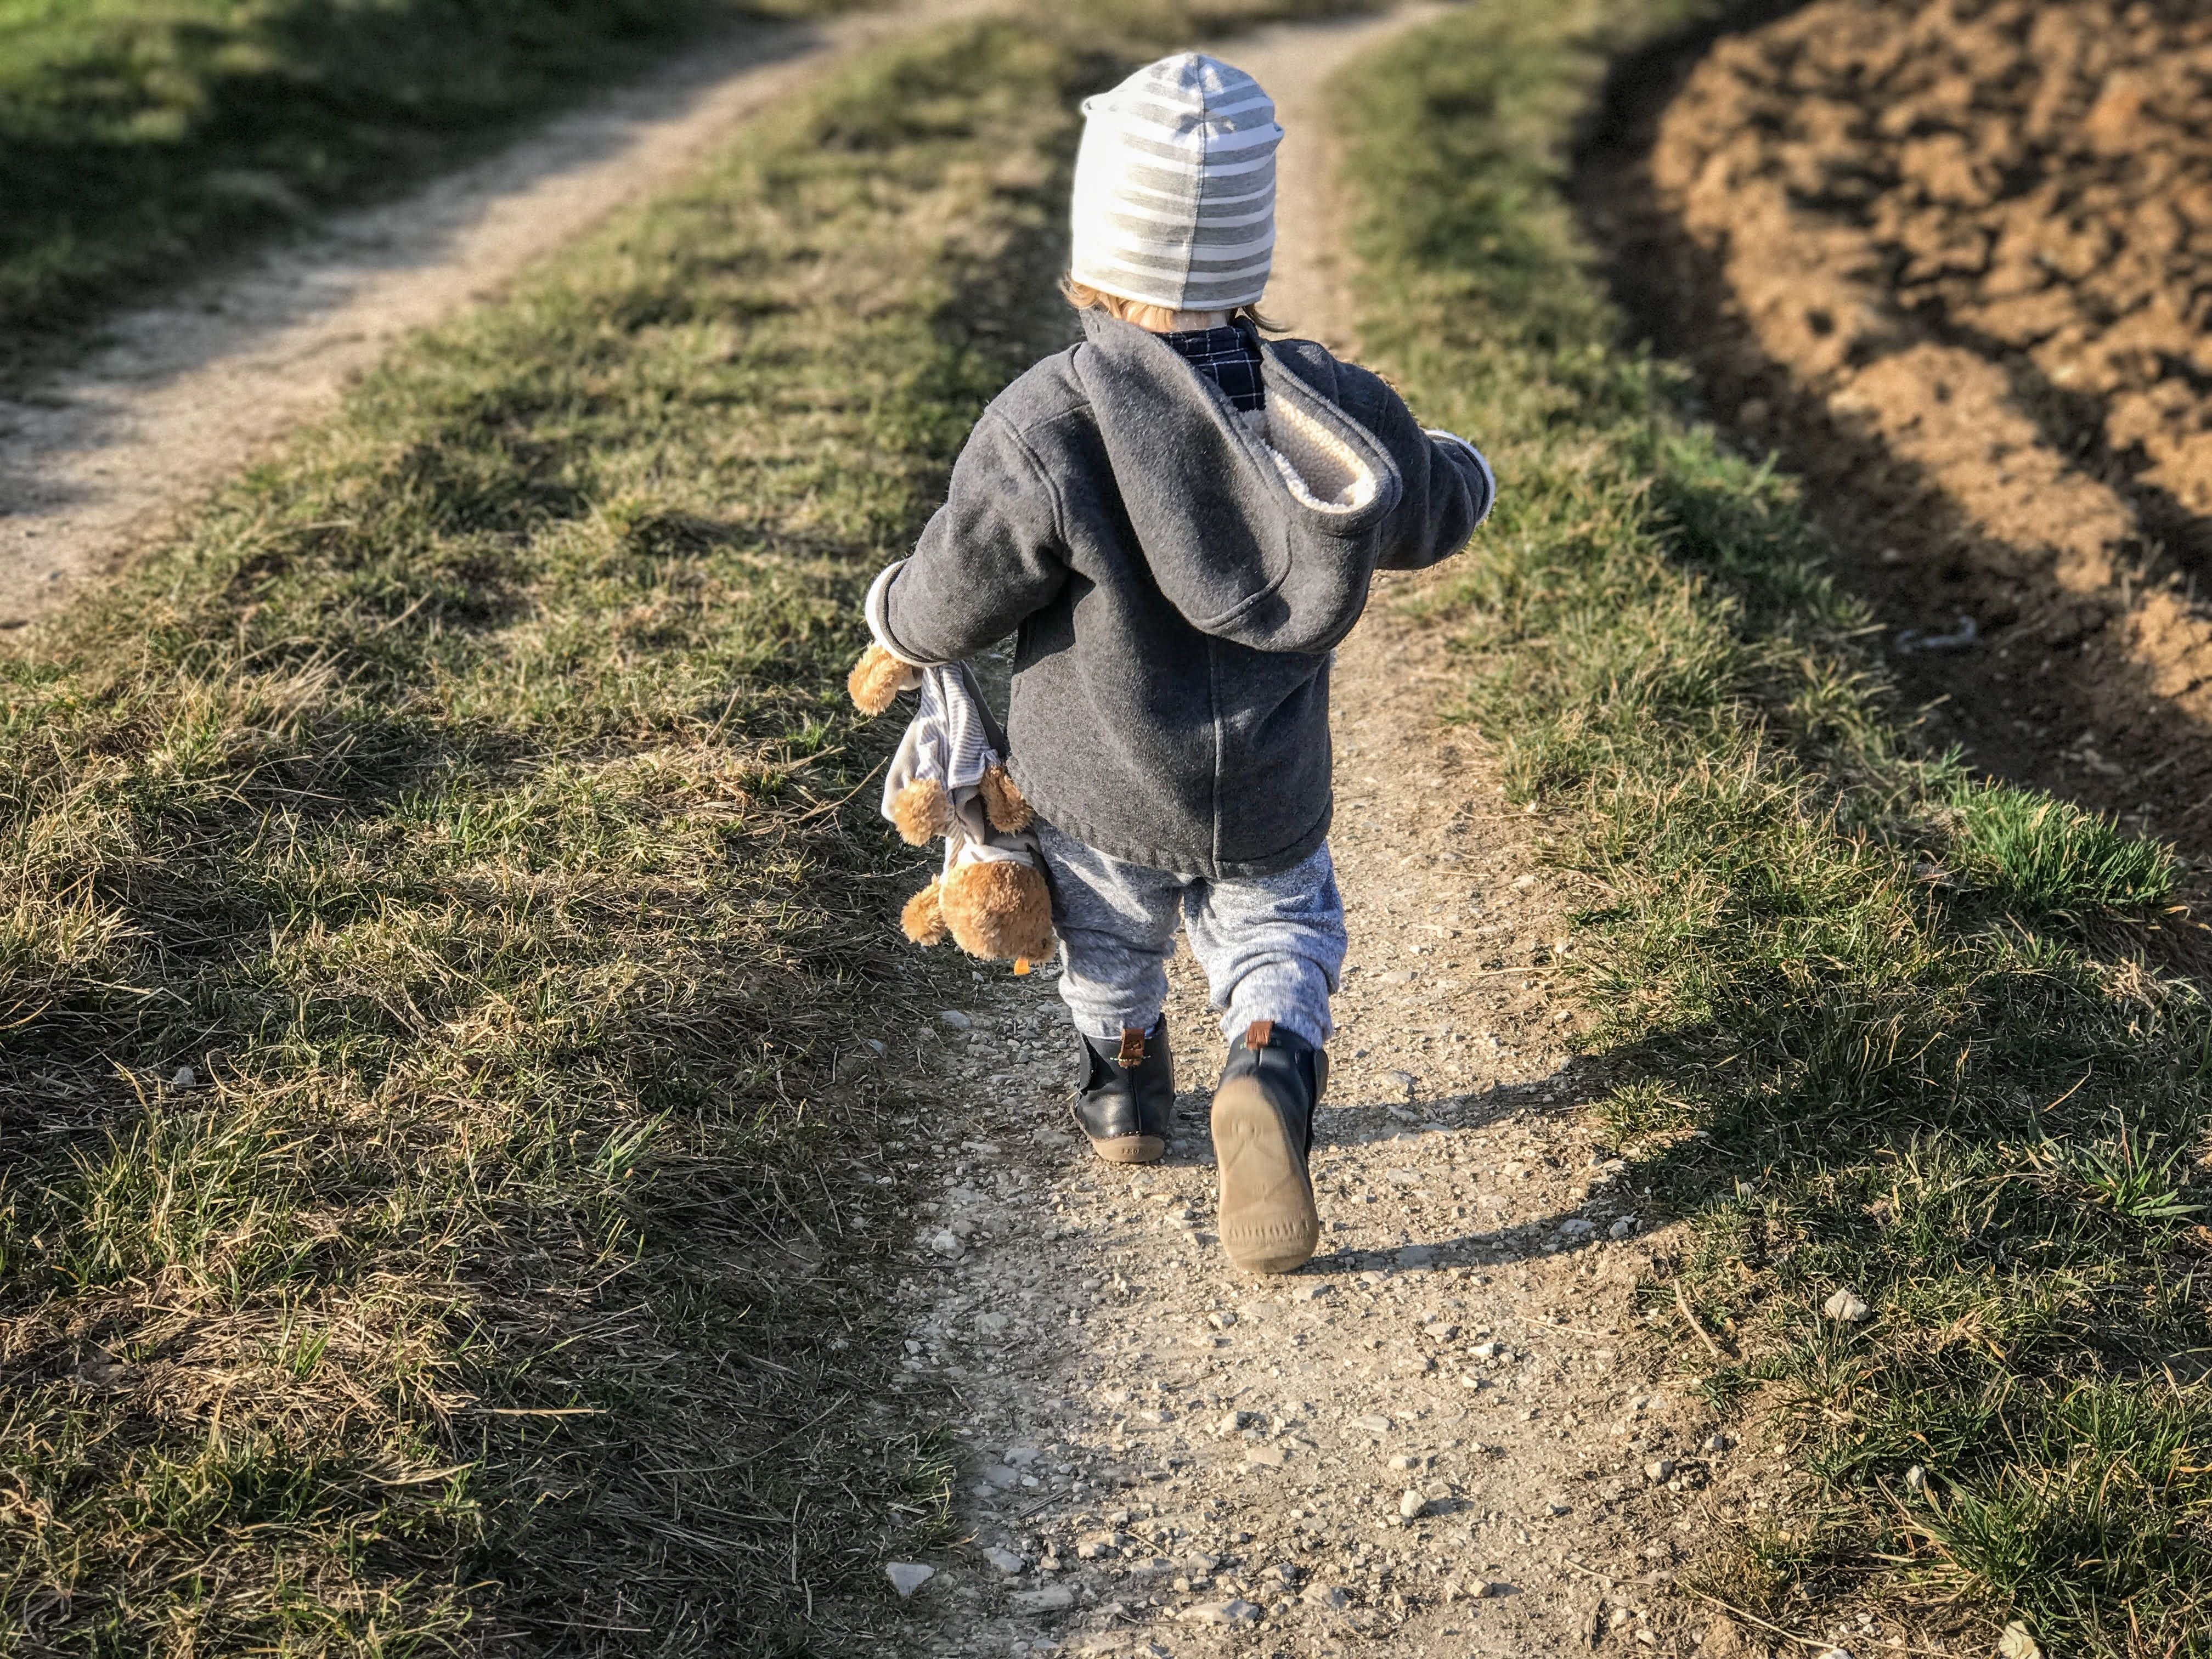 Willensstarke Kinder